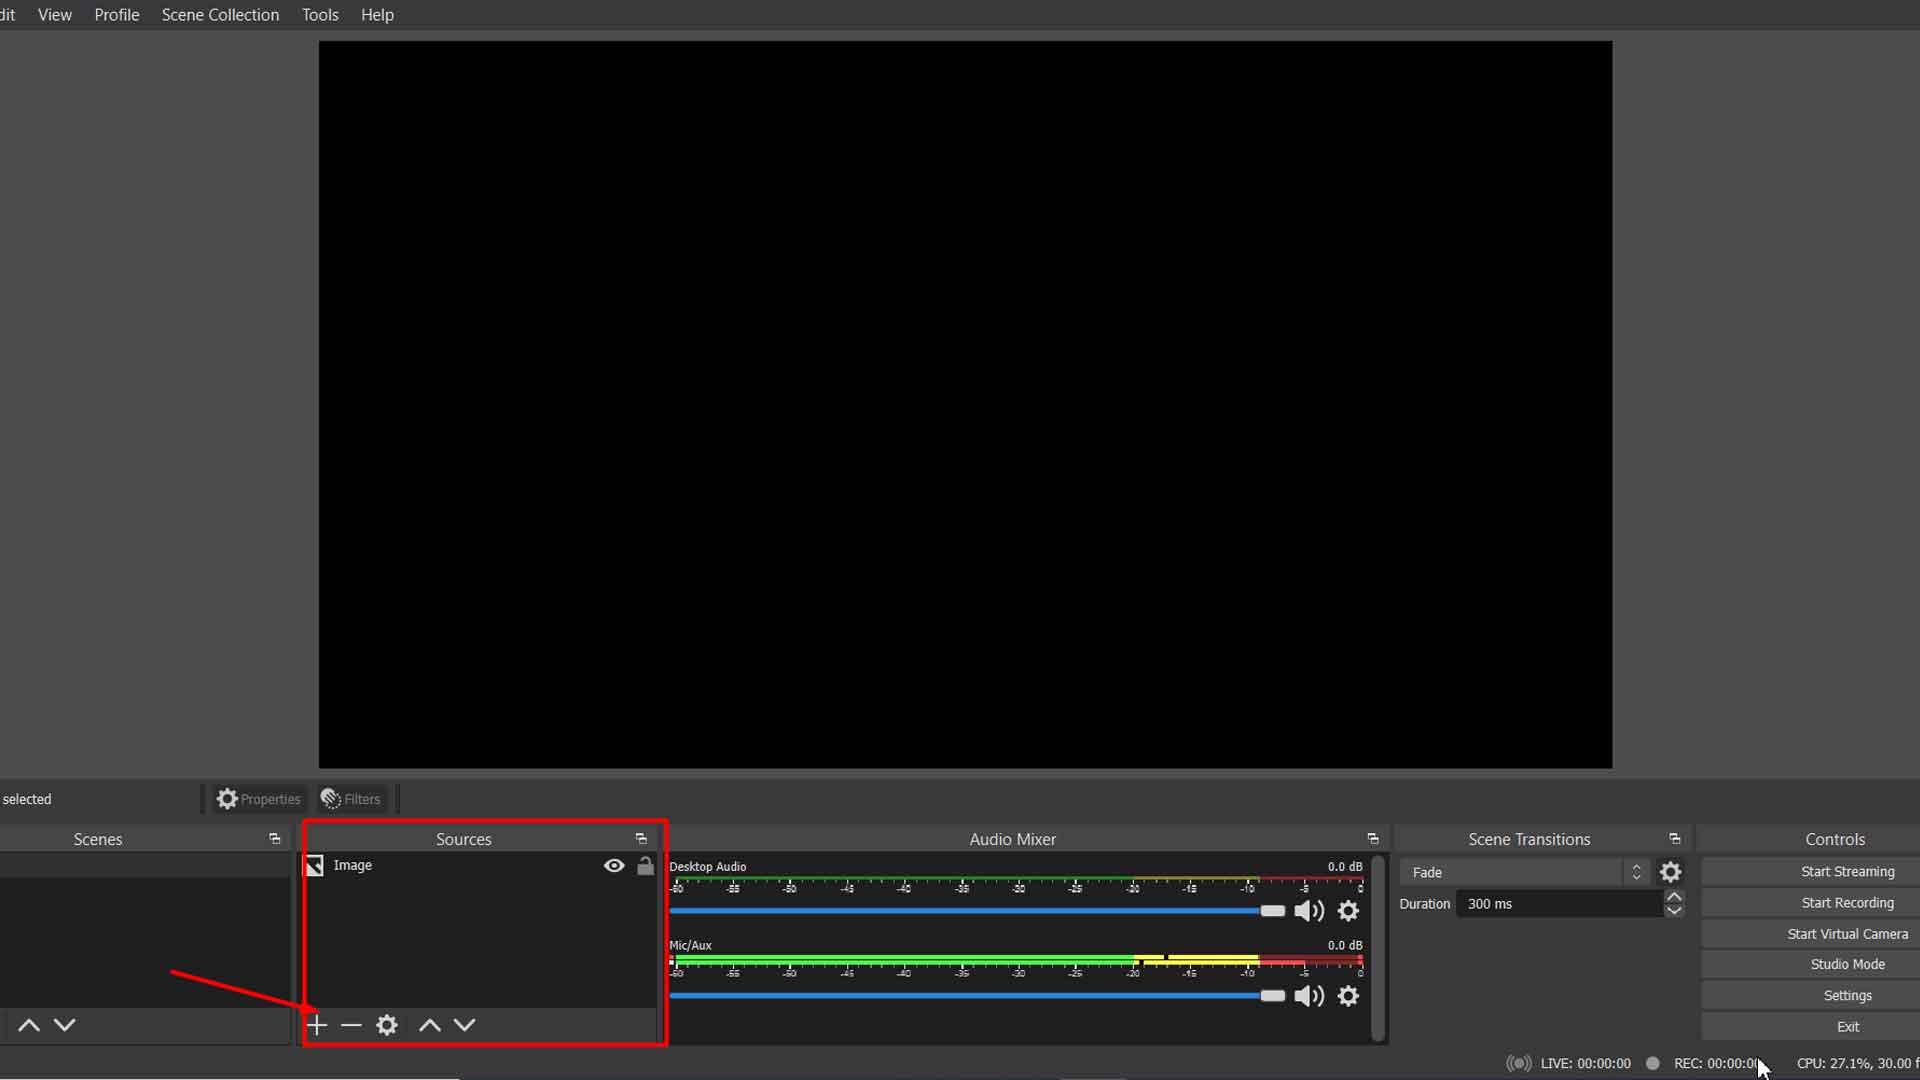 How to Set up Stream Overlay